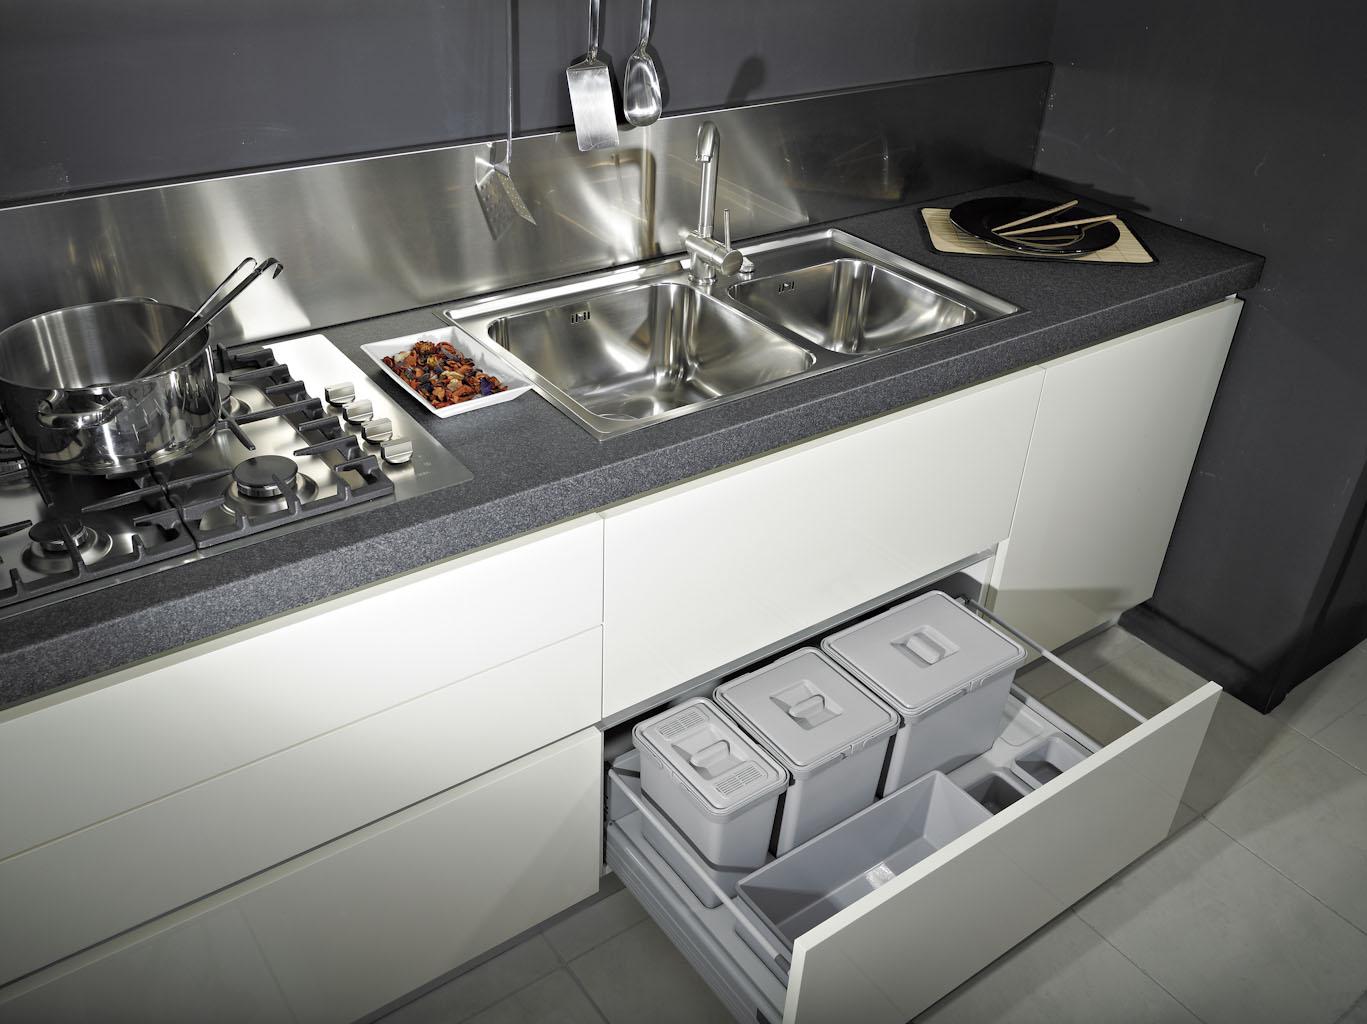 Pattumiera per cassetto cucina ecologica modulo 120cm - Pattumiere per cucina ...